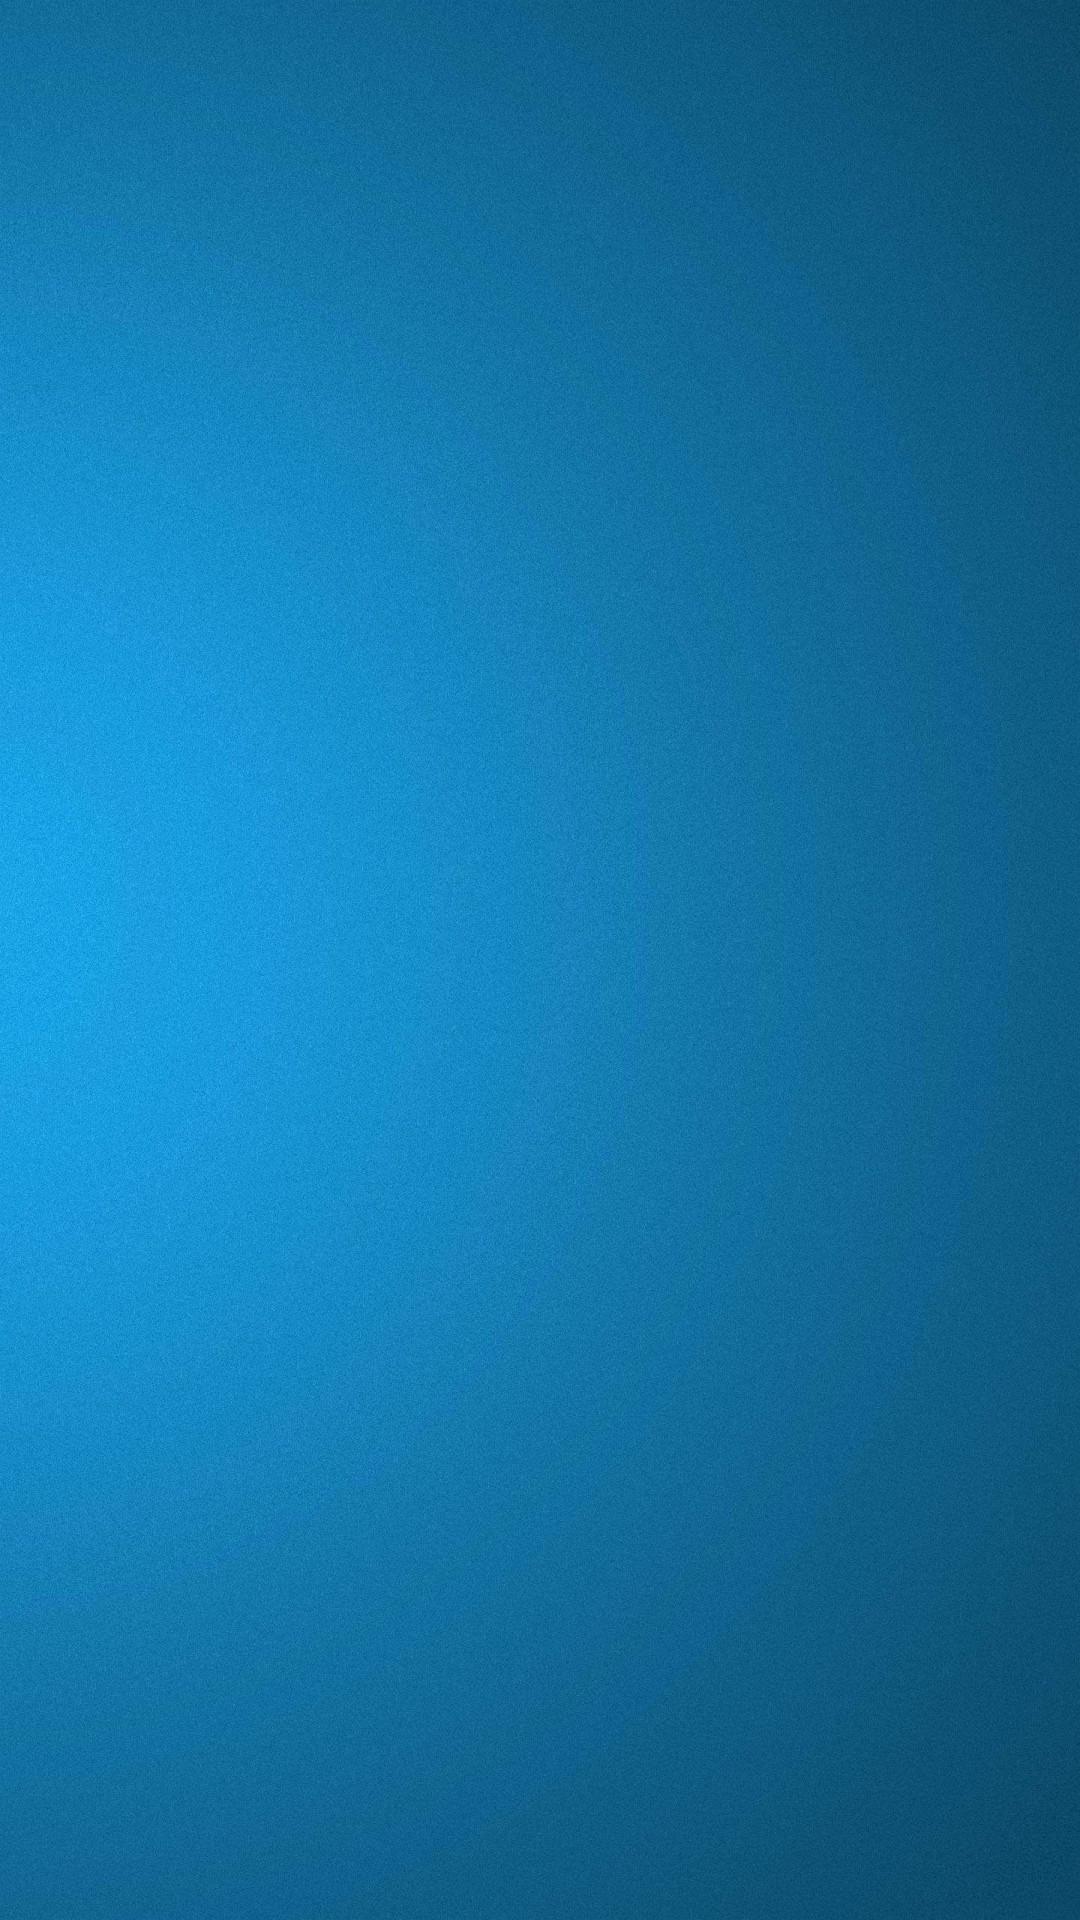 blue iphone 6 wallpaper – Bing images